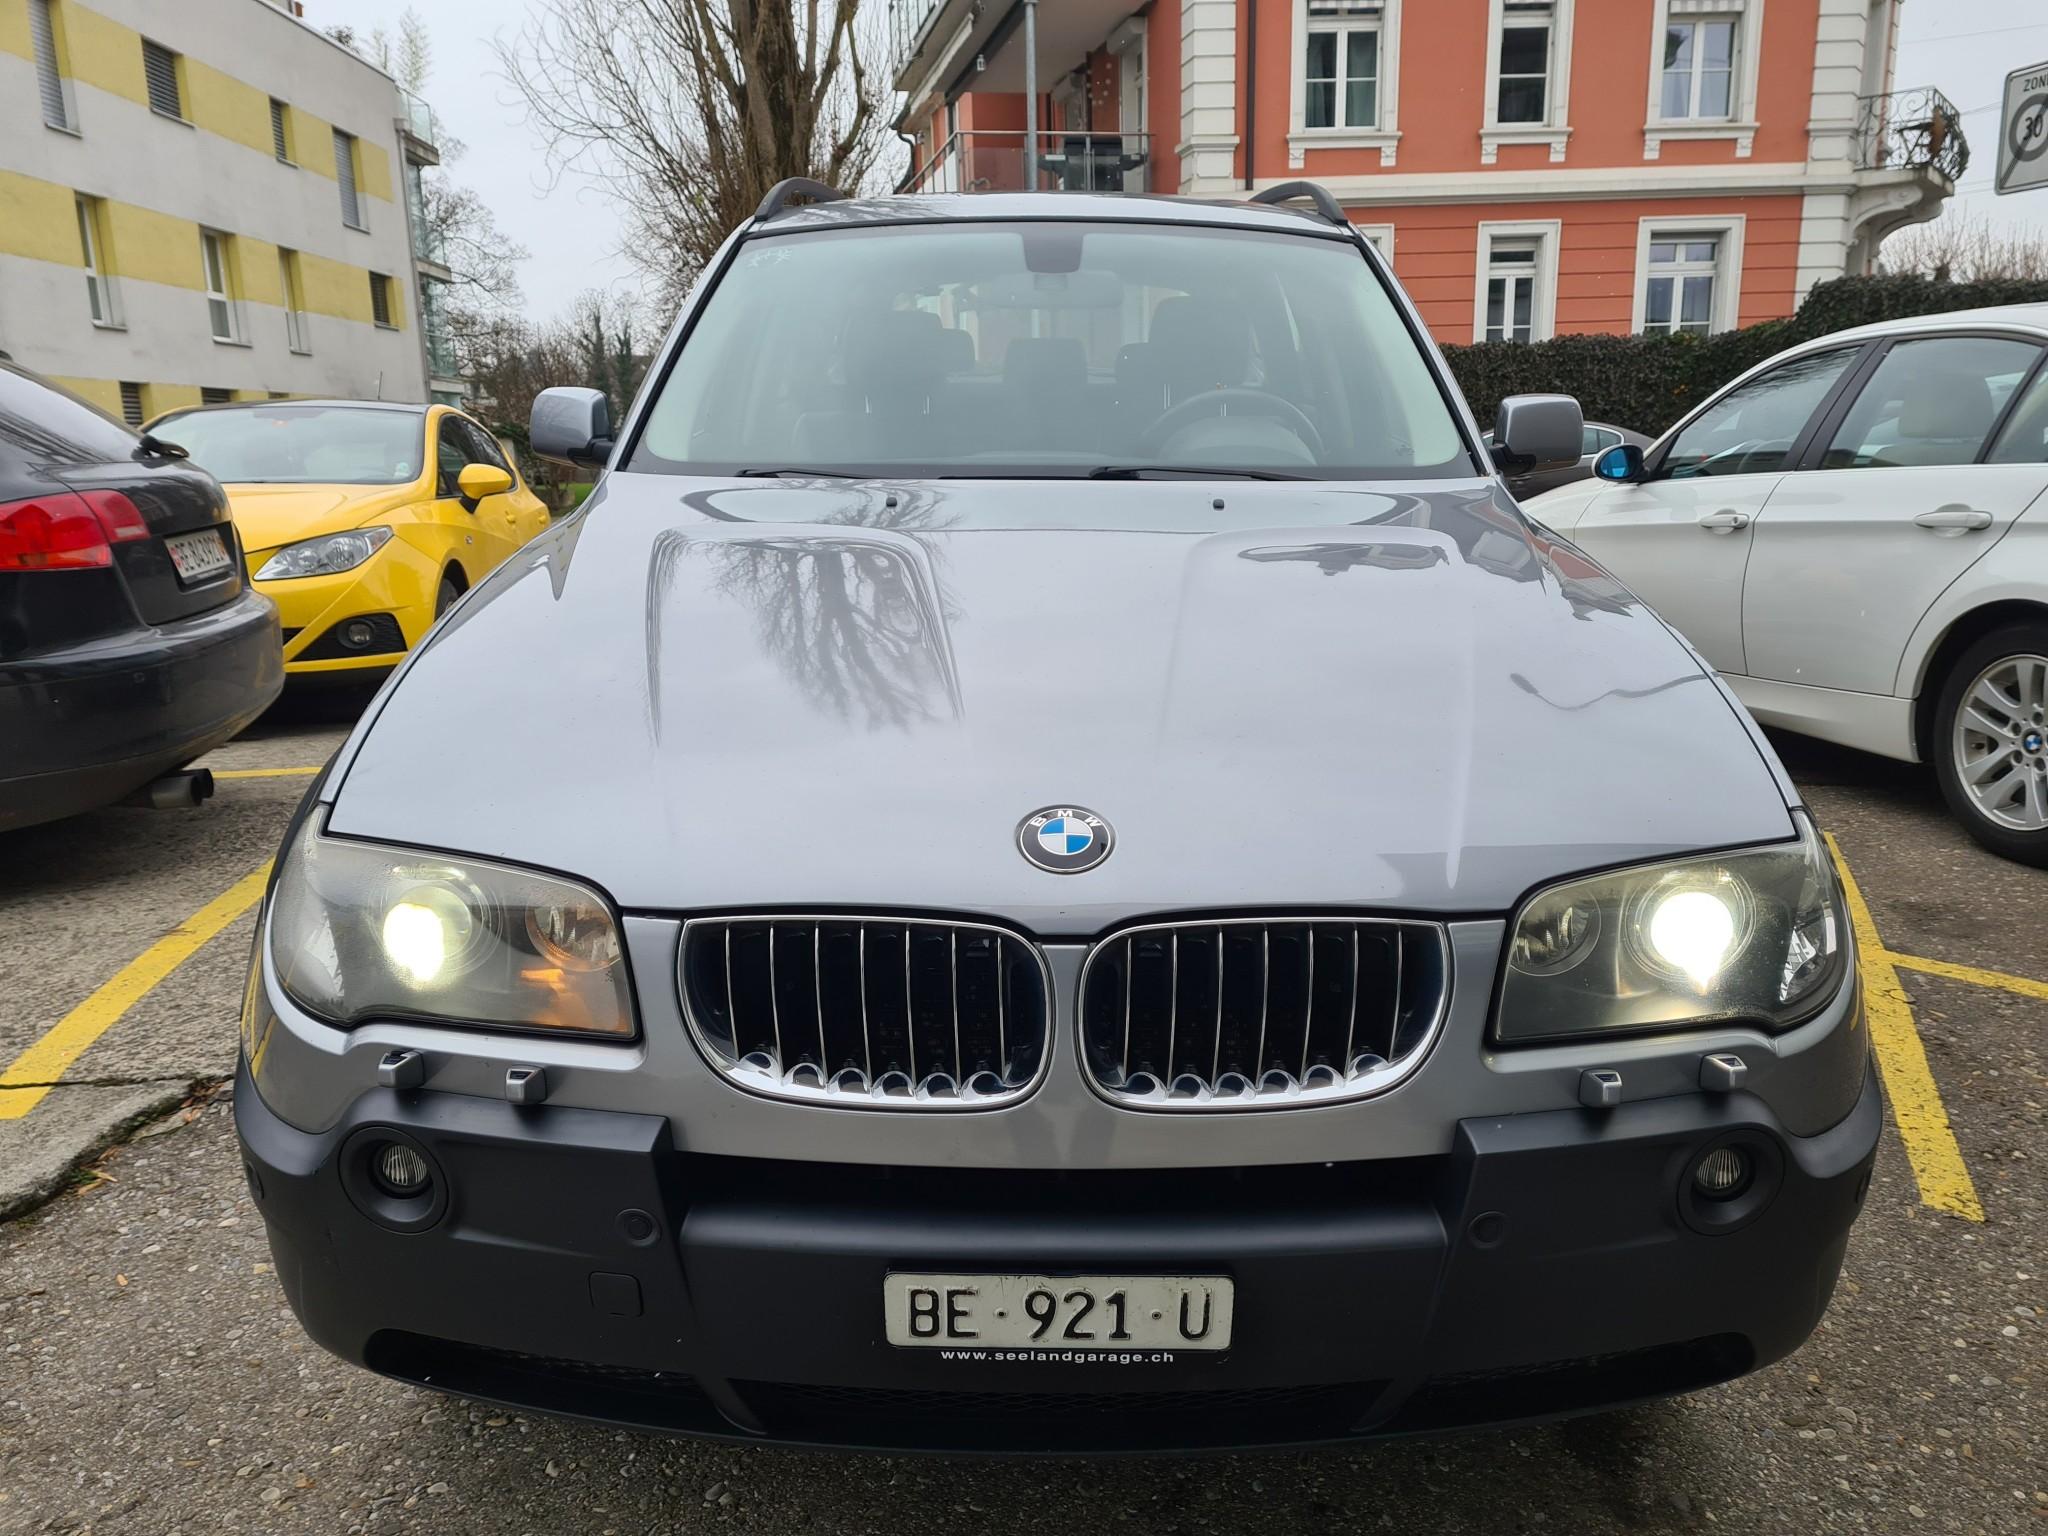 suv BMW X3 . 3.0 d année 2006 237000km expertisée 11.2019